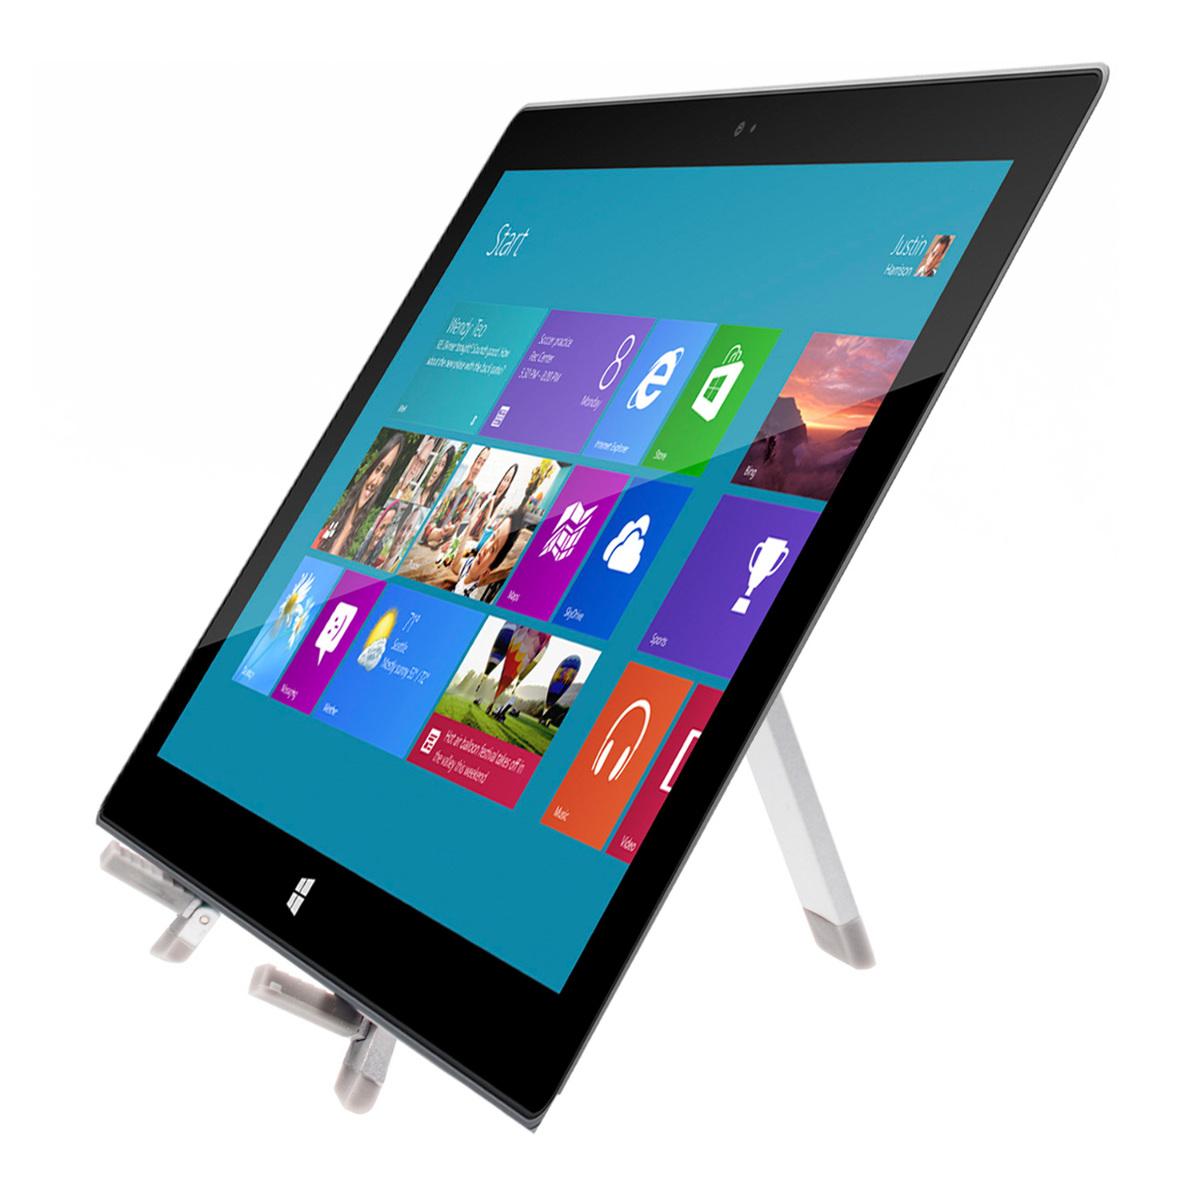 kwmobile tablet halter f r microsoft surface rt st nder. Black Bedroom Furniture Sets. Home Design Ideas